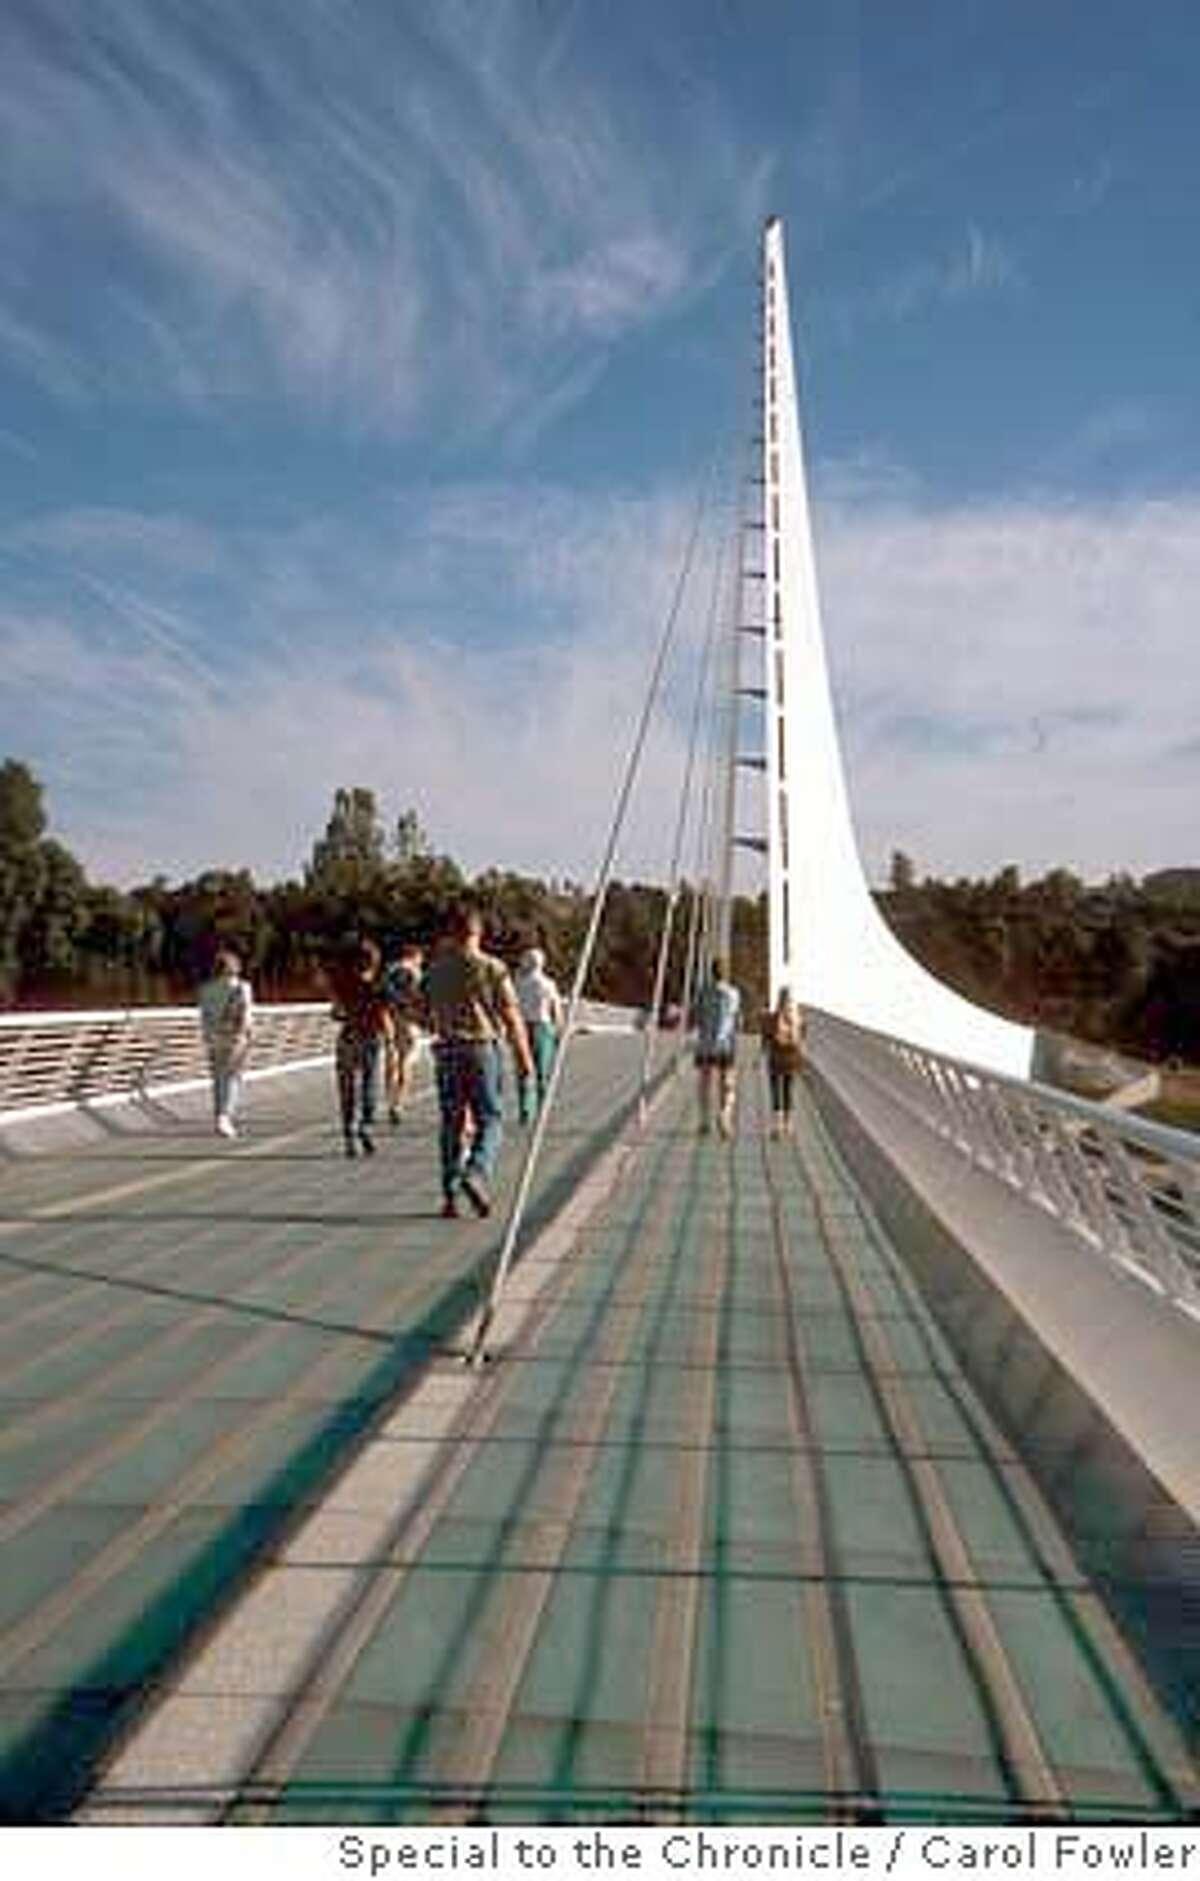 Sundial Bridge Sacramento River Redding Ca Photo Credit: Carol Fowler/special to Chron